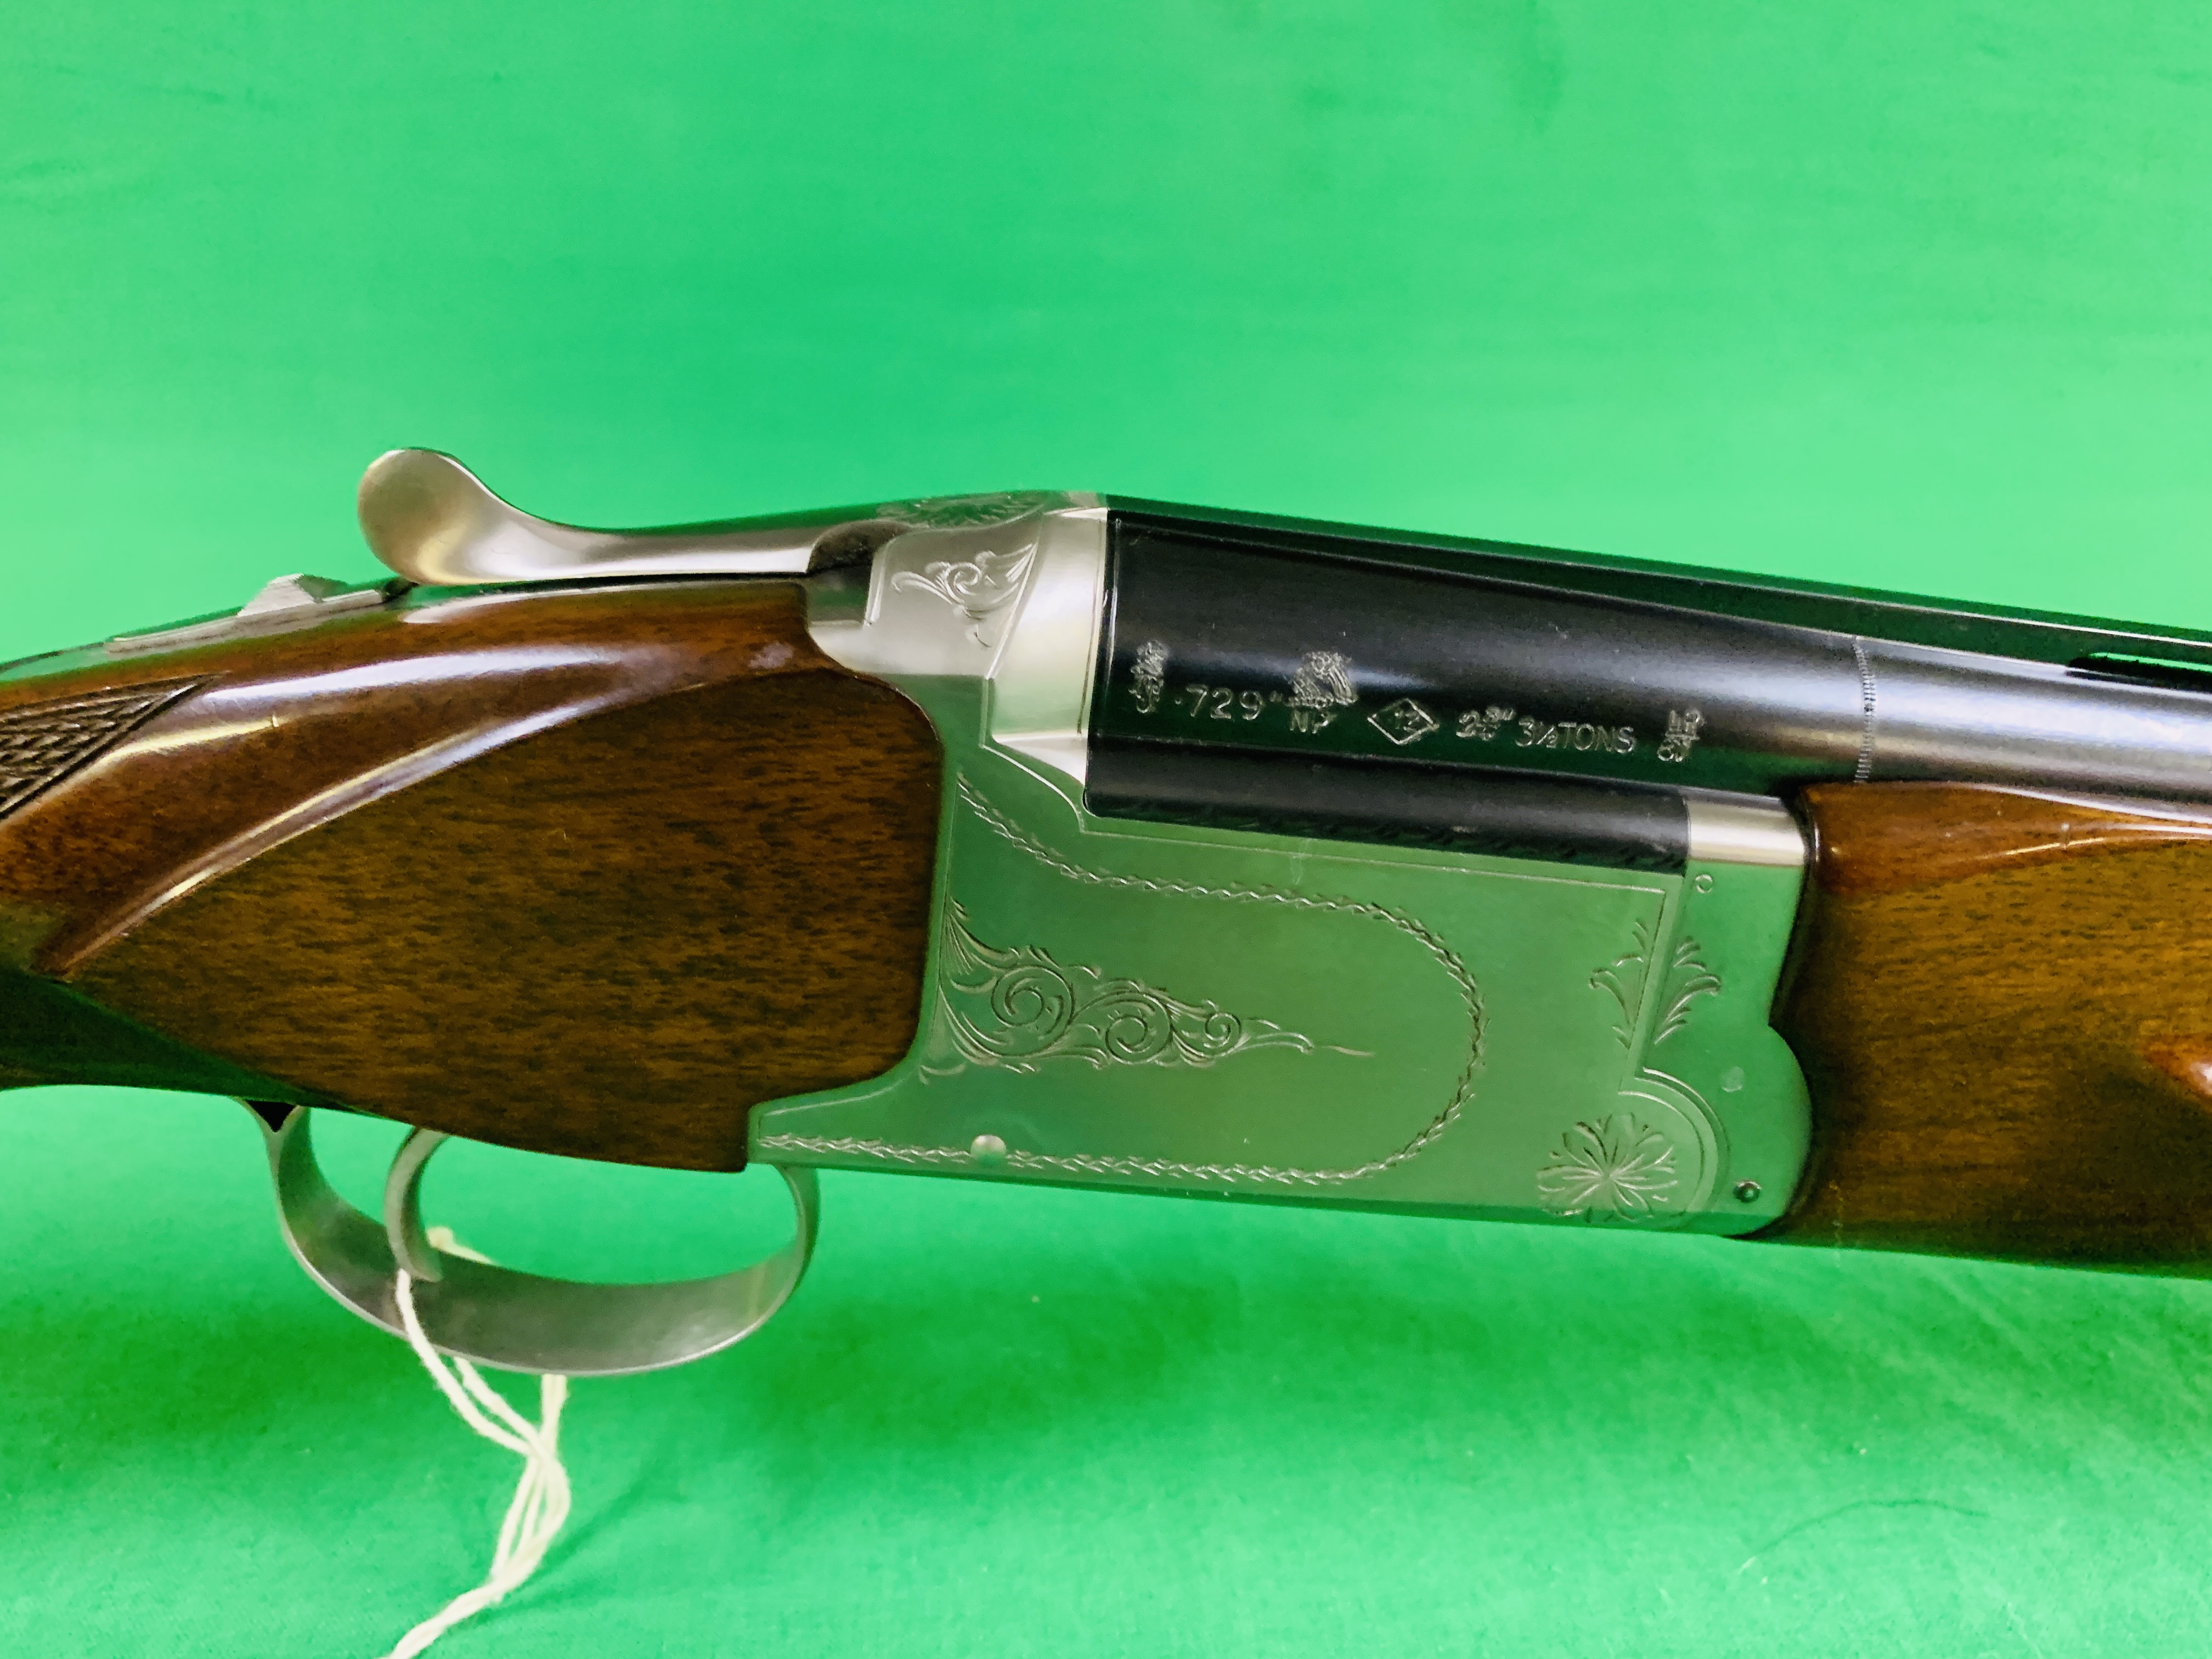 NIKKO 5000 12 BORE OVER AND UNDER SHOTGUN # K629564 - FIXED CHOKE, - Image 3 of 8